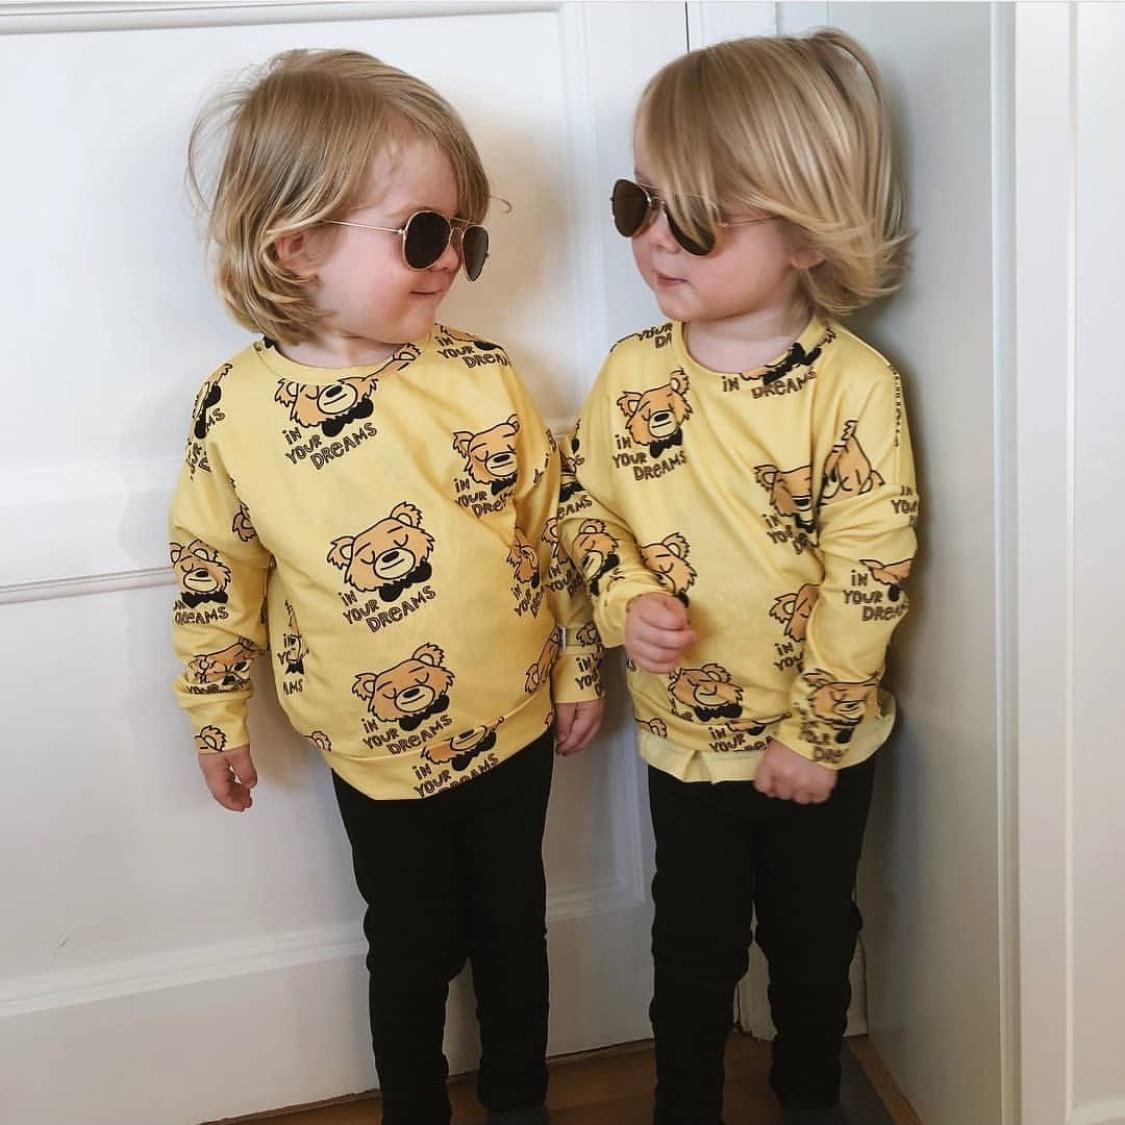 2021 Autumn Kids Long Sleeve T-shirt Sweatshirt Baby Girls Clothes Boys Jackets Coats Cartoon Tops Vacation Toddler Outfit Tops 5